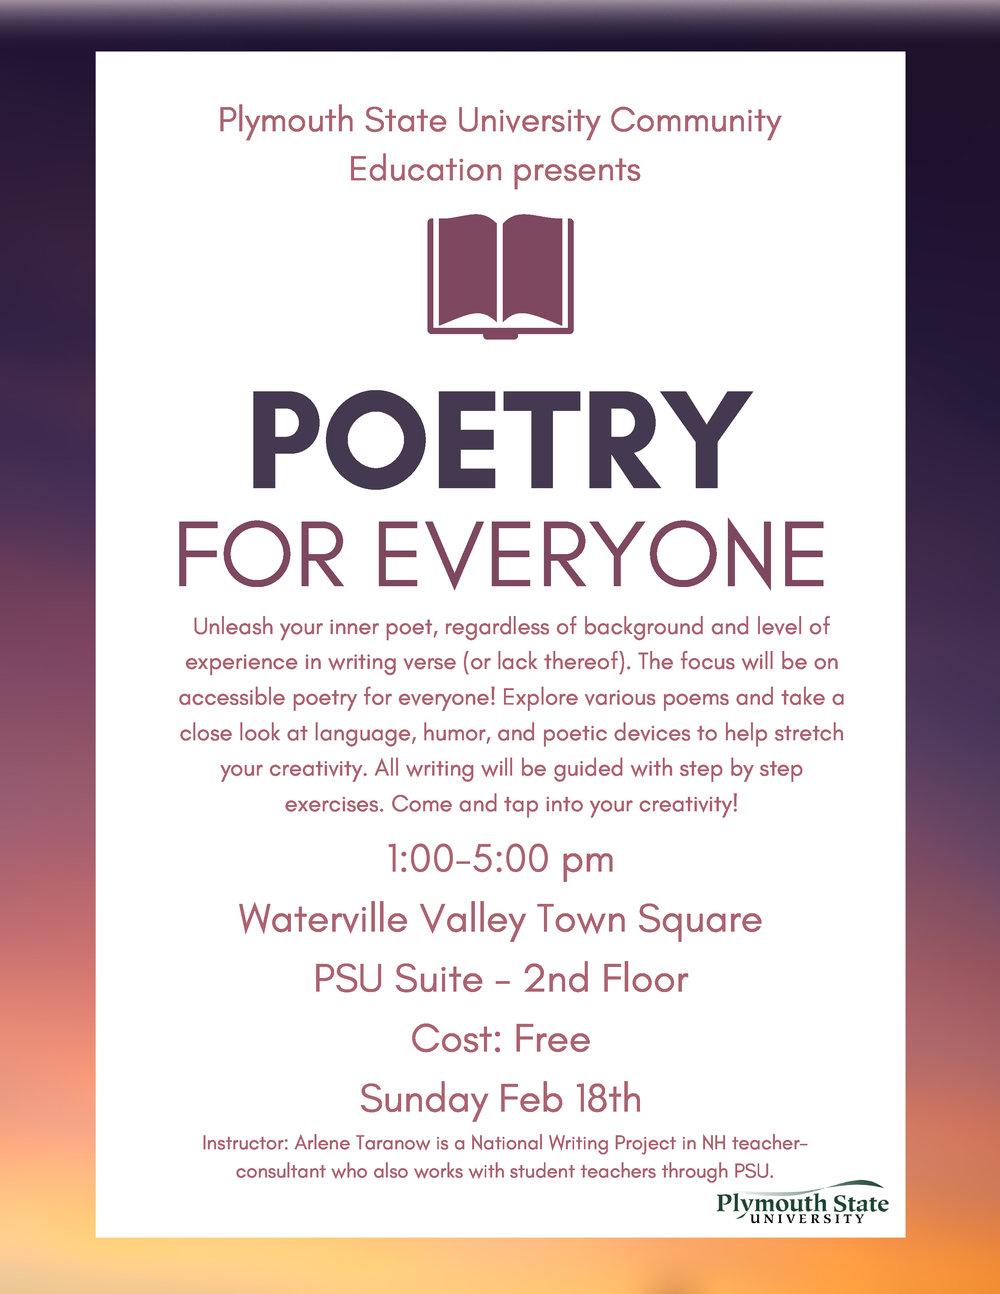 Poetry for Everyone Flyer.jpg